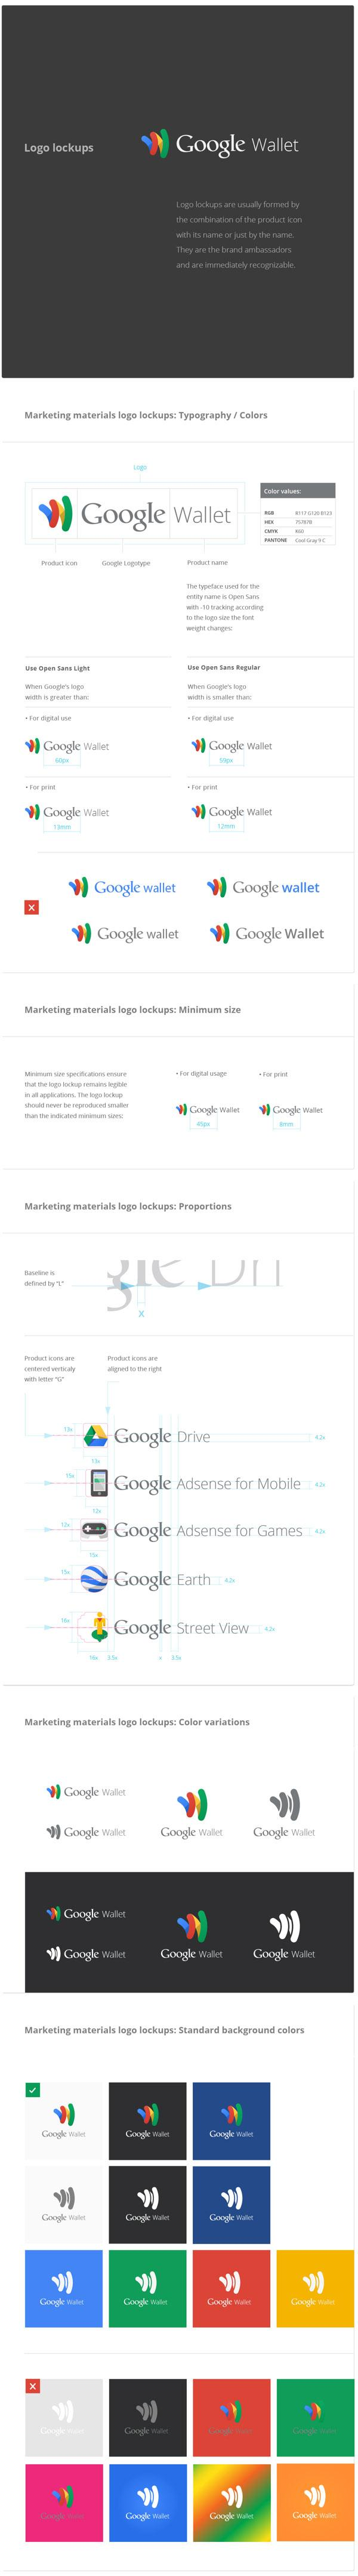 Google-Kurumsal-Kimlik-3